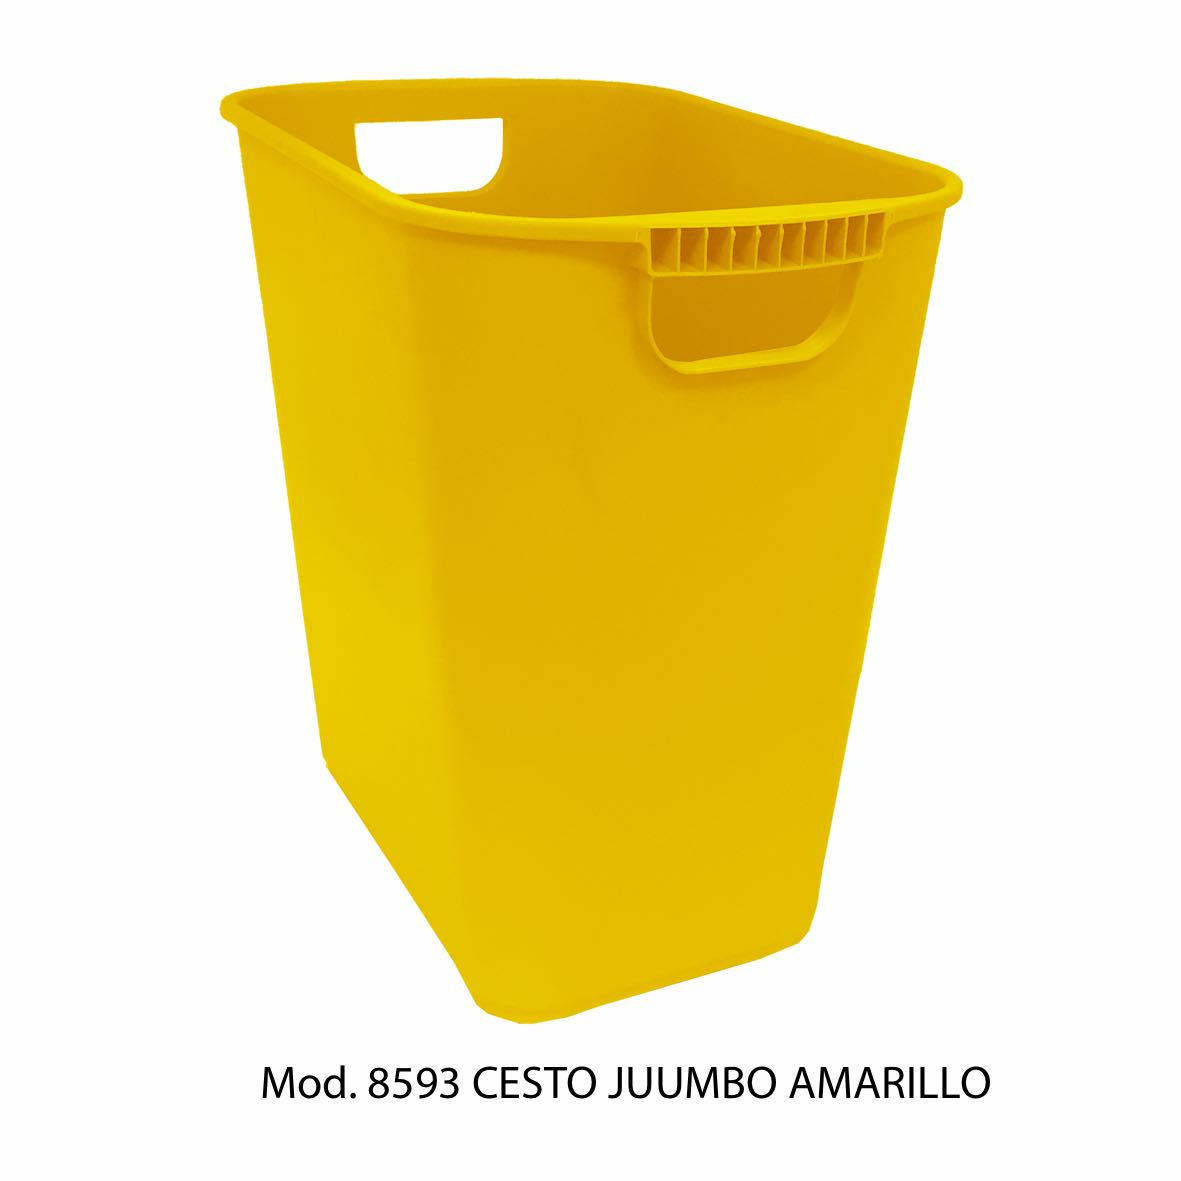 Bote de basura jumbo color naranja modelo 8593 - Sablón